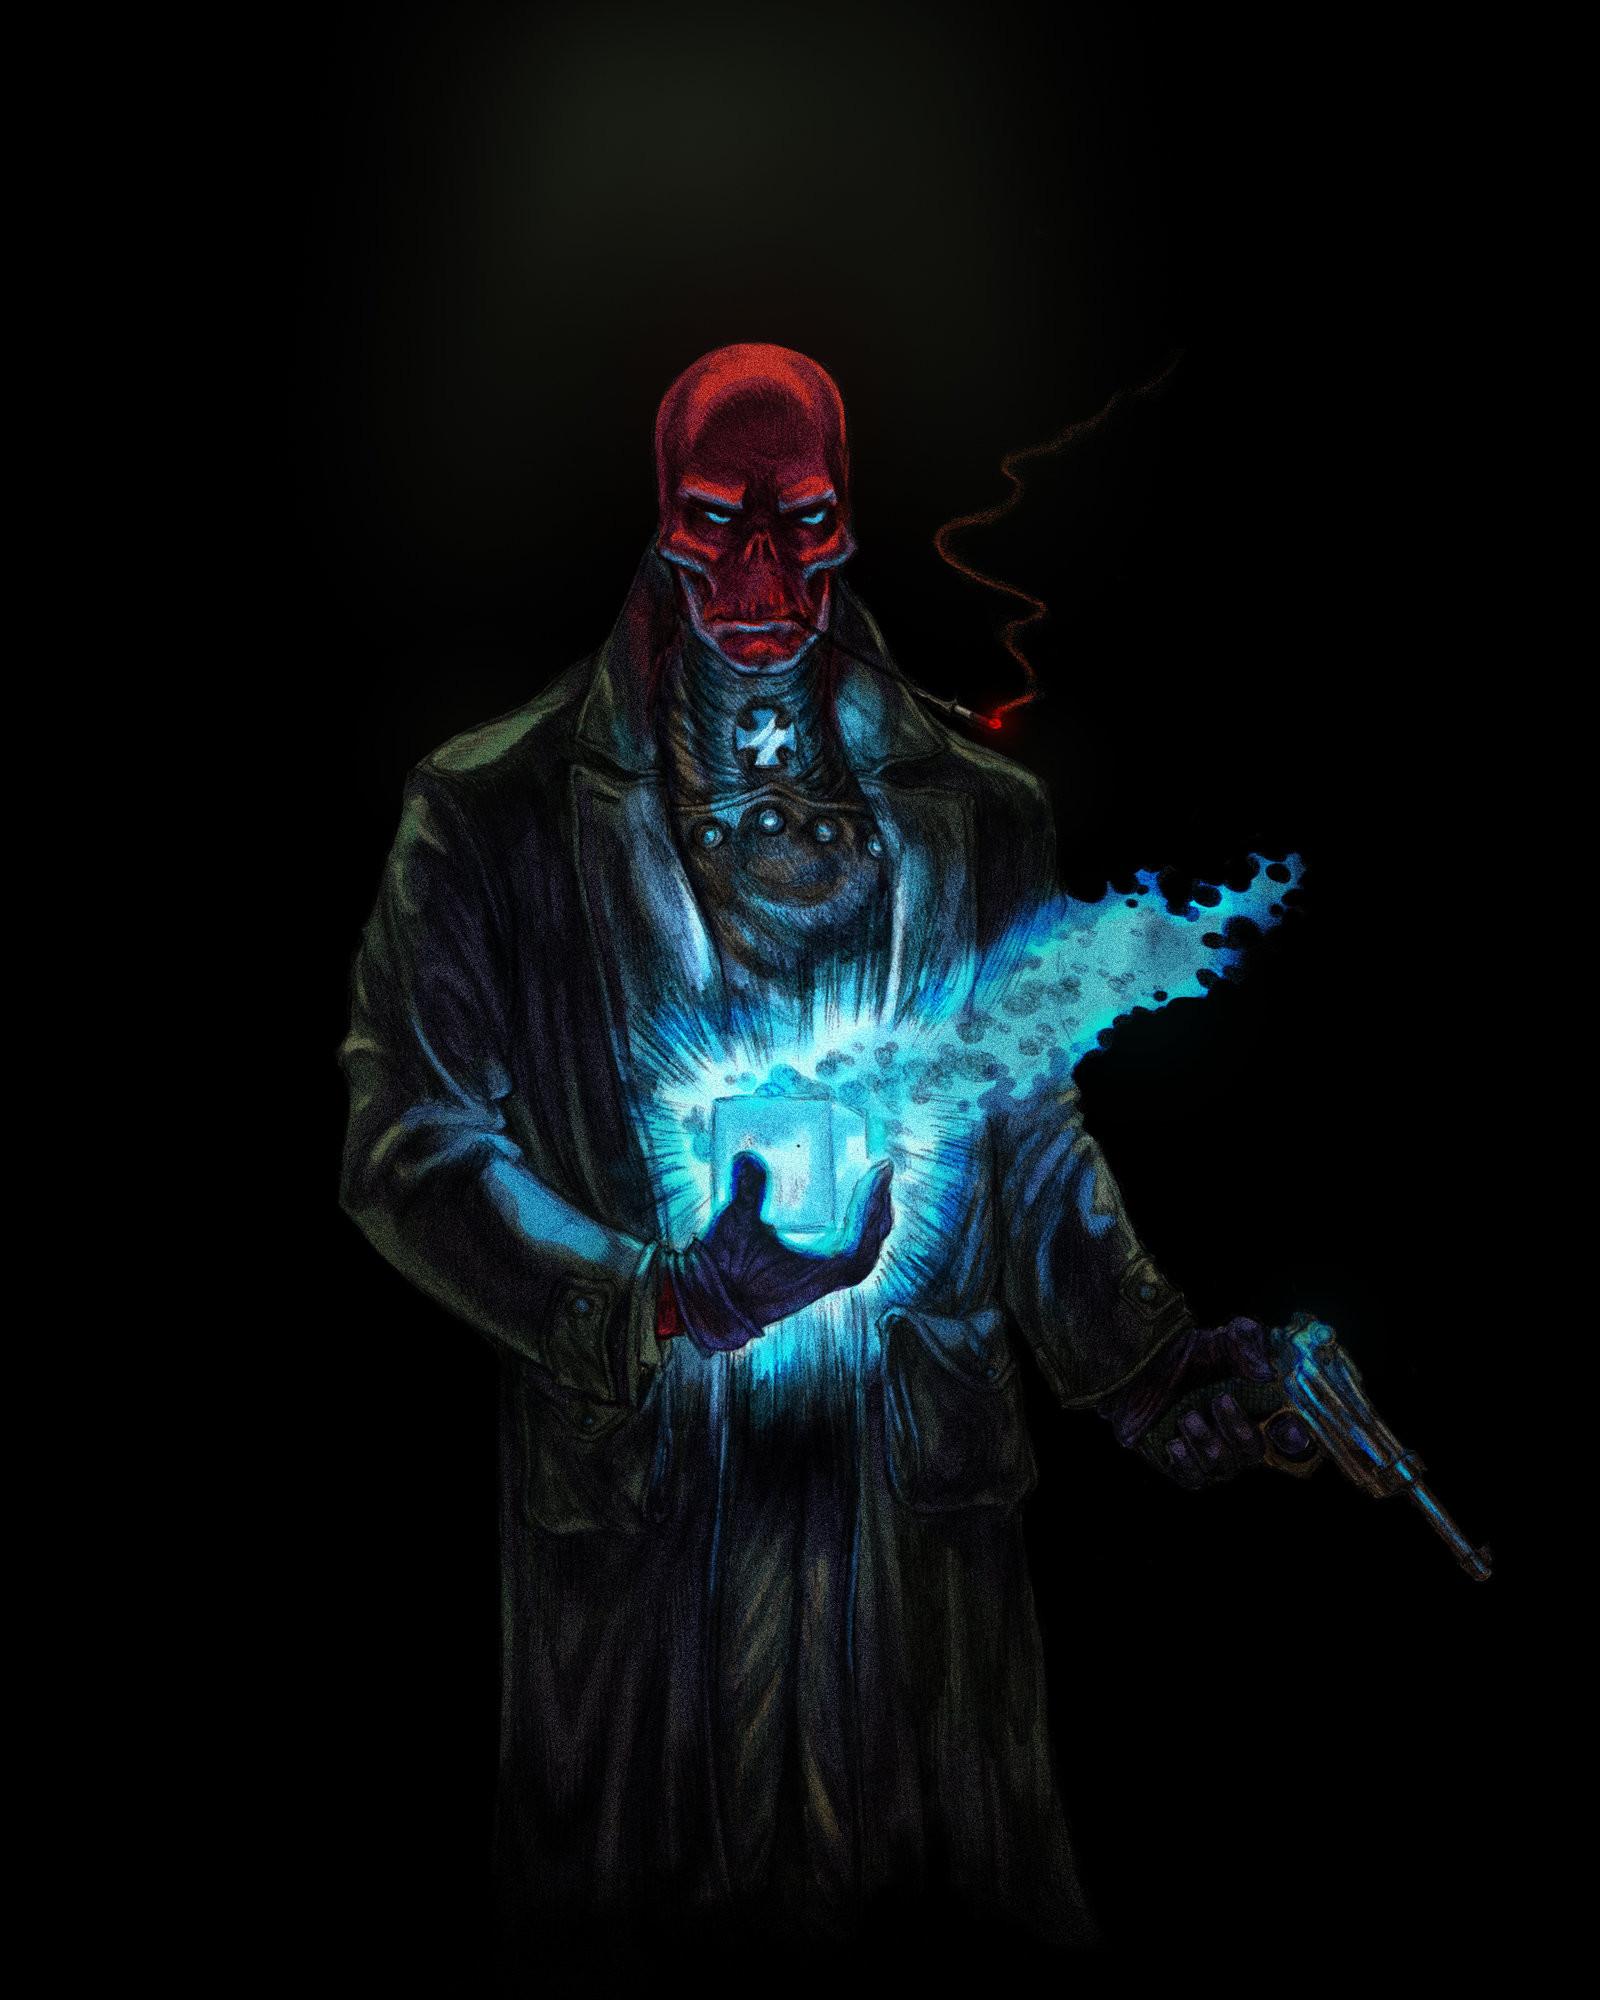 Diablo 3 Wallpaper 1920x1080: Marvel Red Skull Wallpaper (57+ Images